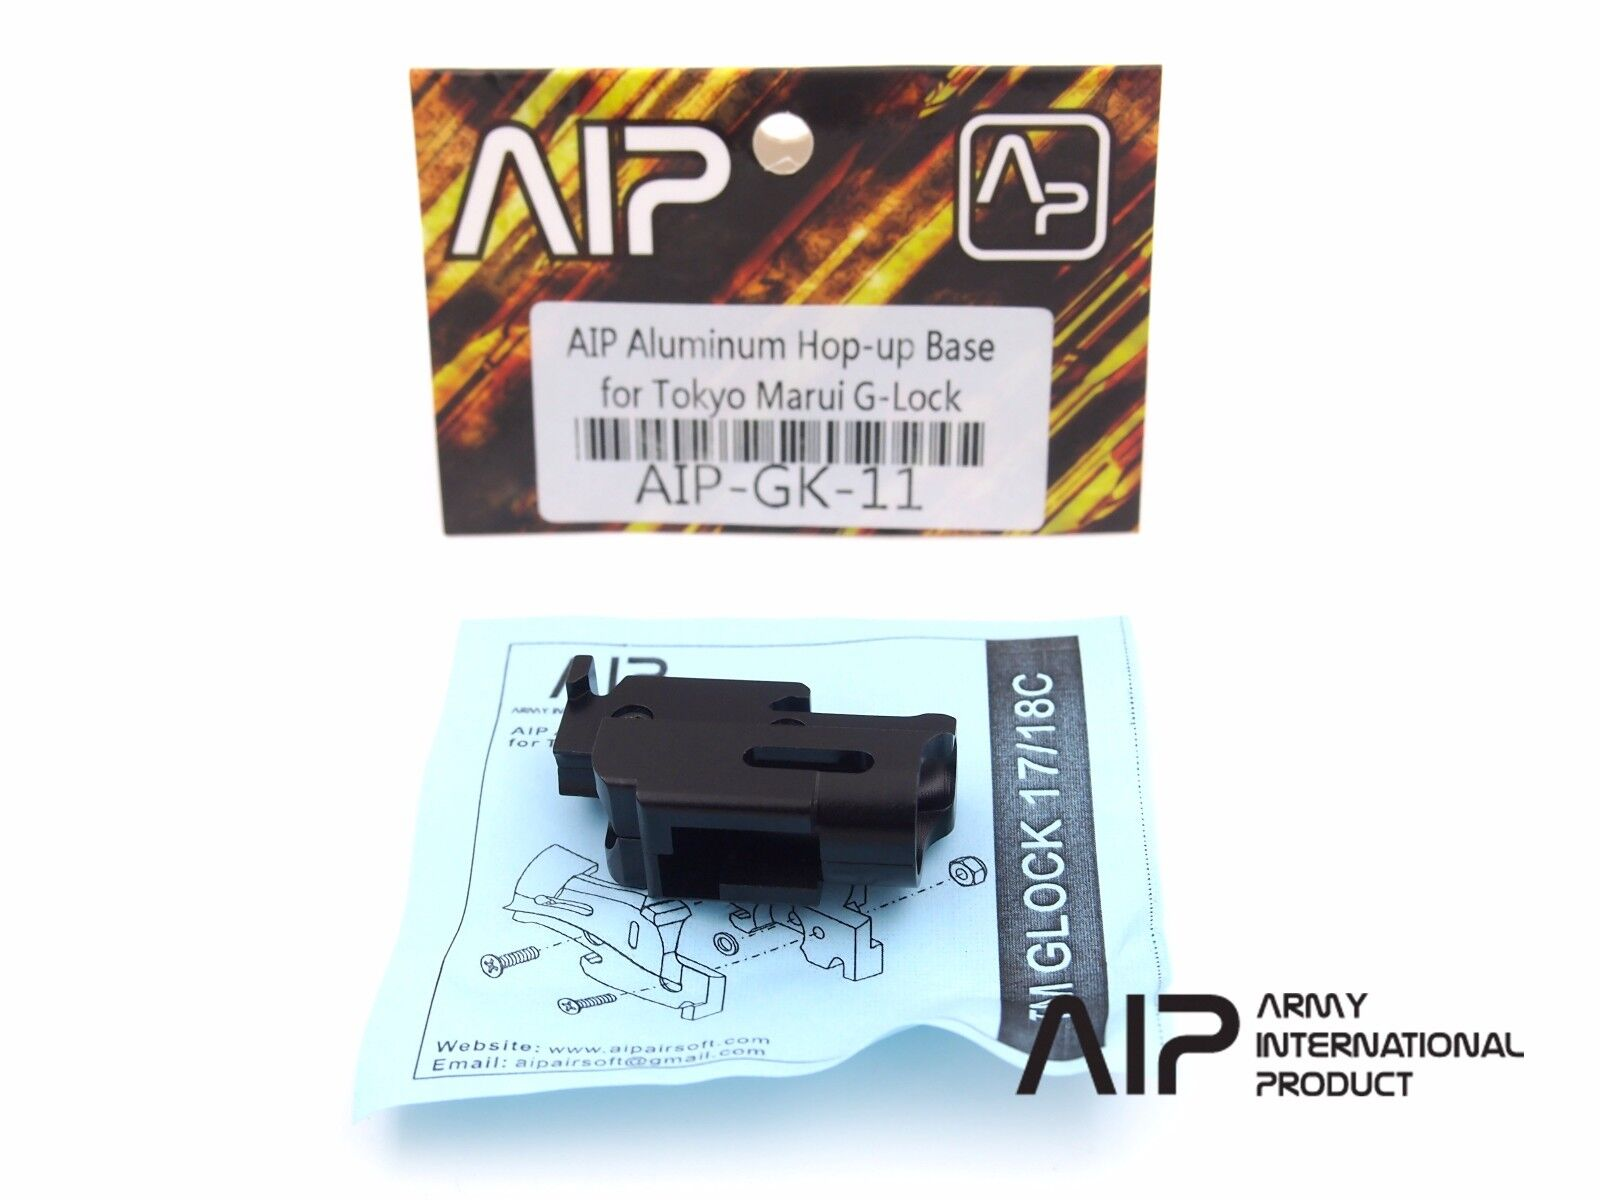 Airsoft AIP Aluminum Hop up Base for Tokyo Marui G17 GBB Softair AIP-GK-11 (663)